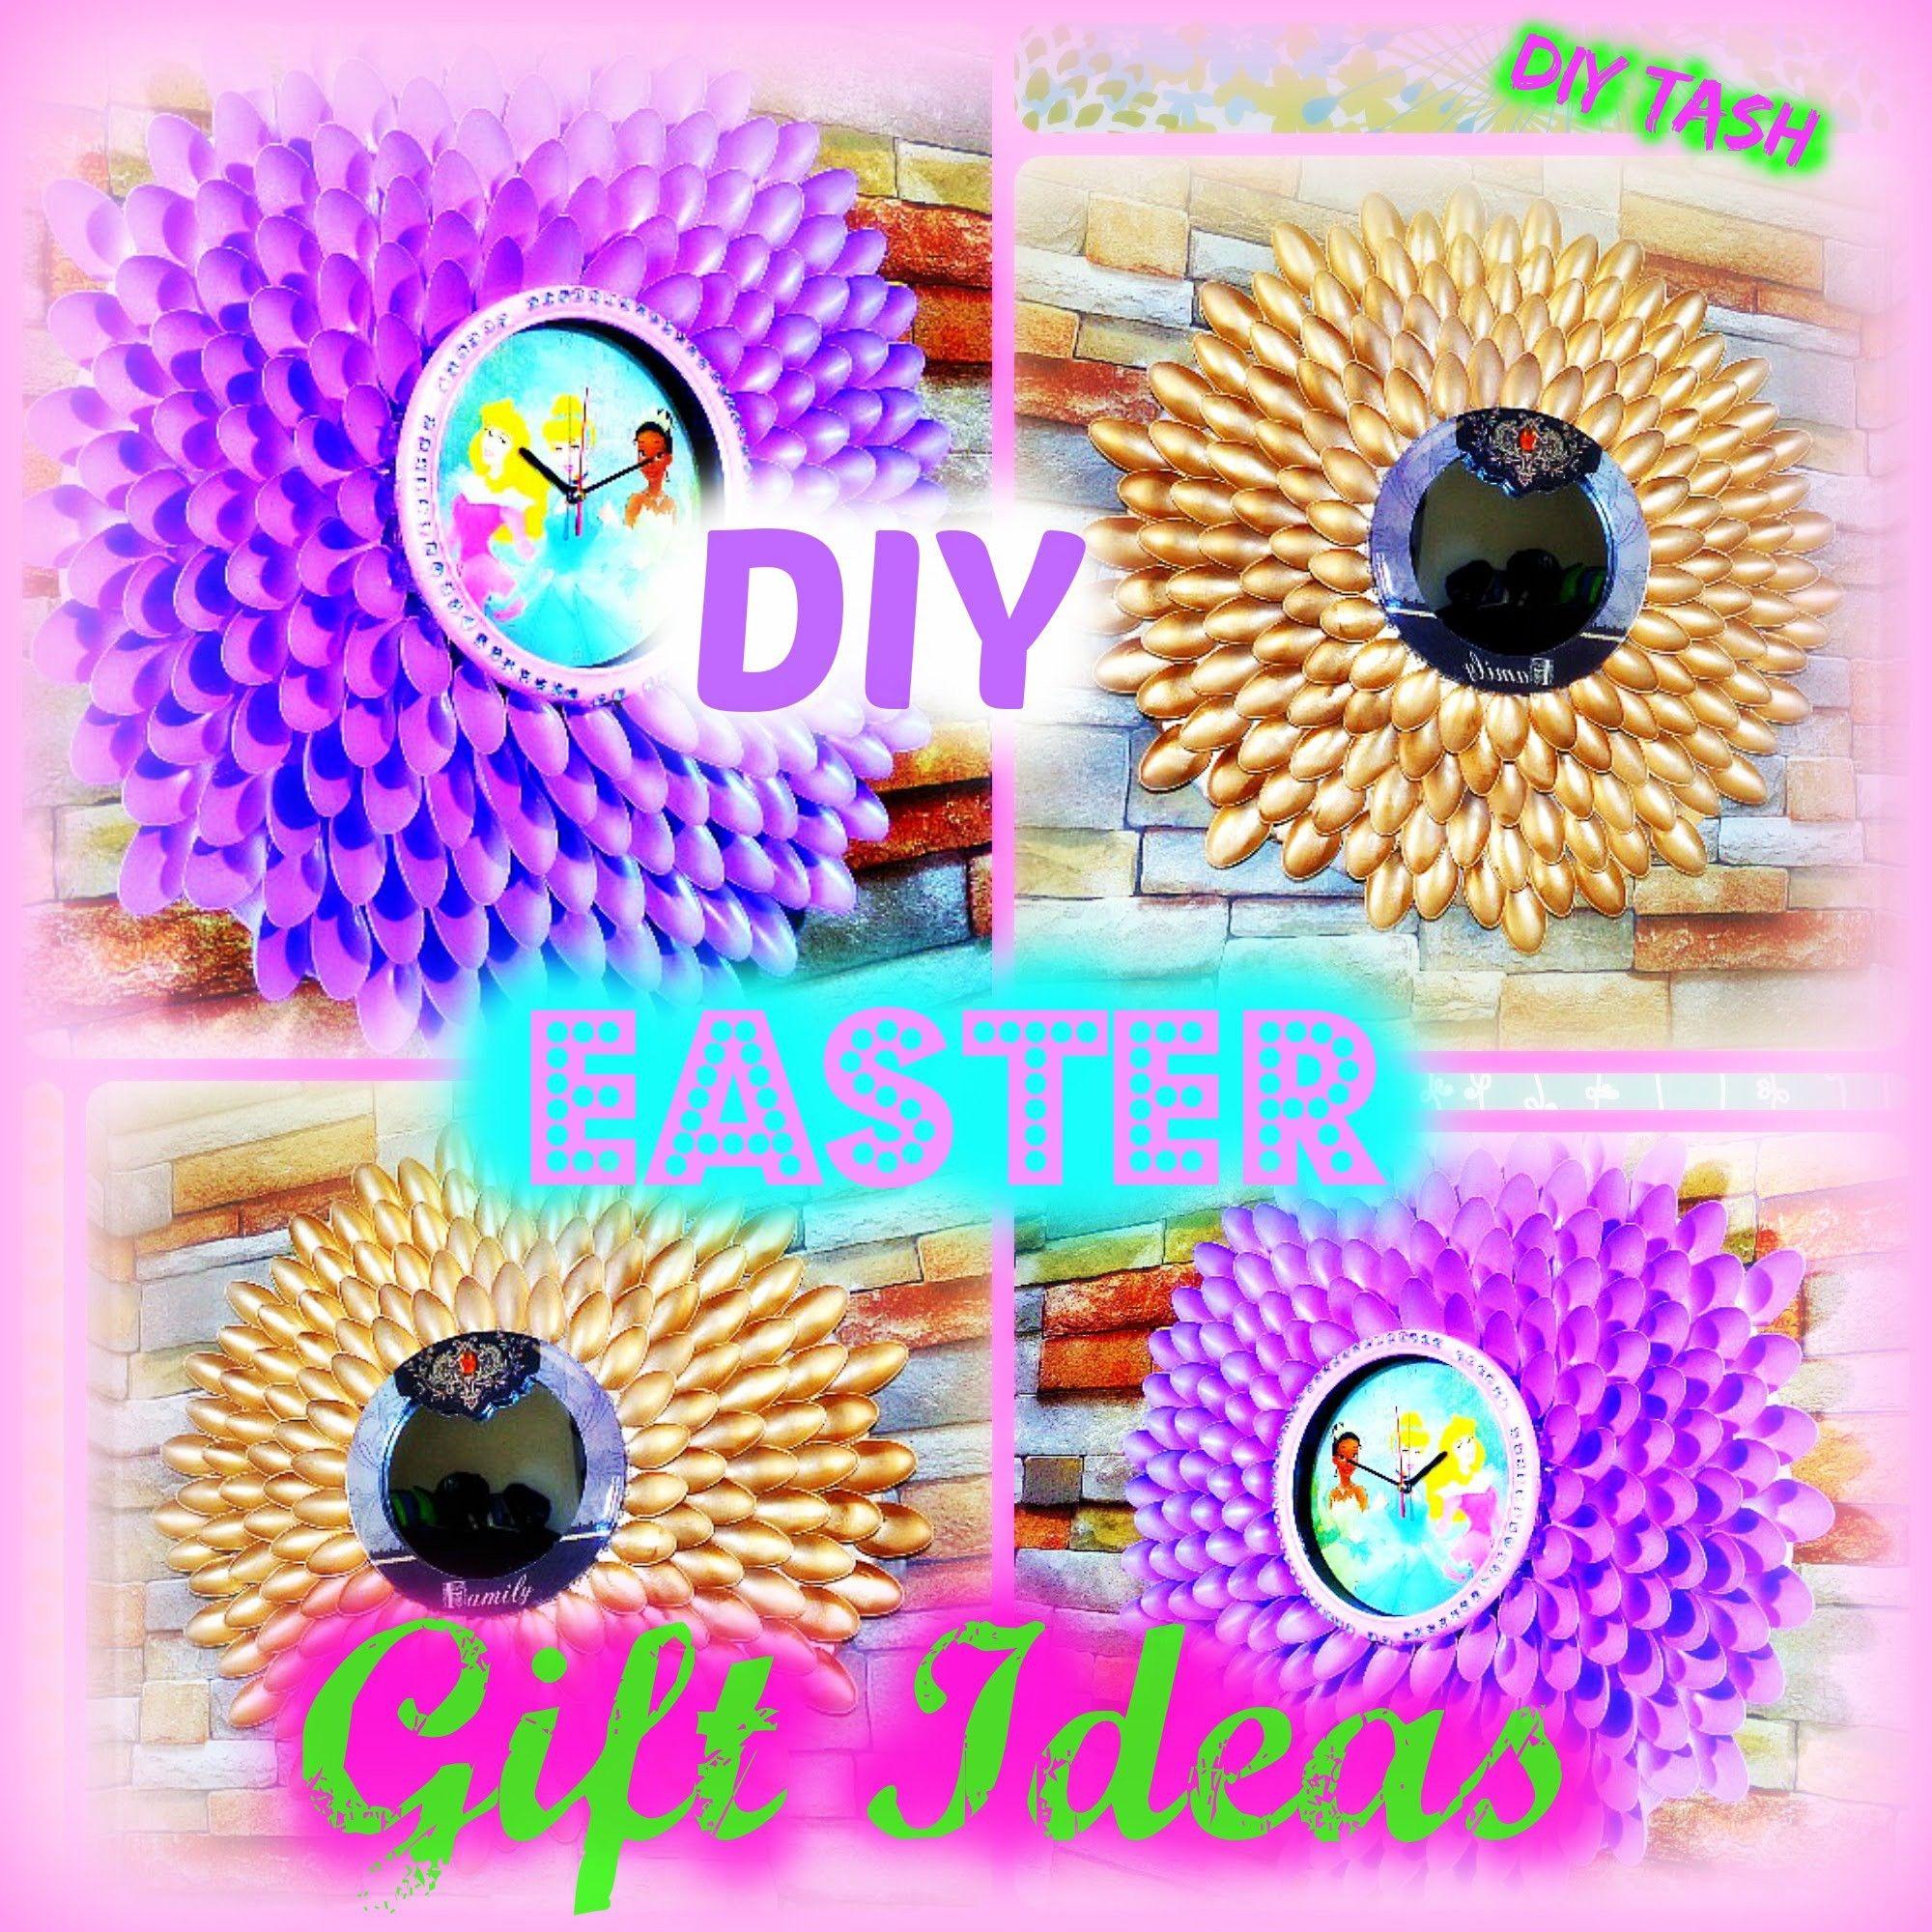 Diy tash ideas diy and crafts and easter gift diy tash easter giftdiy negle Choice Image